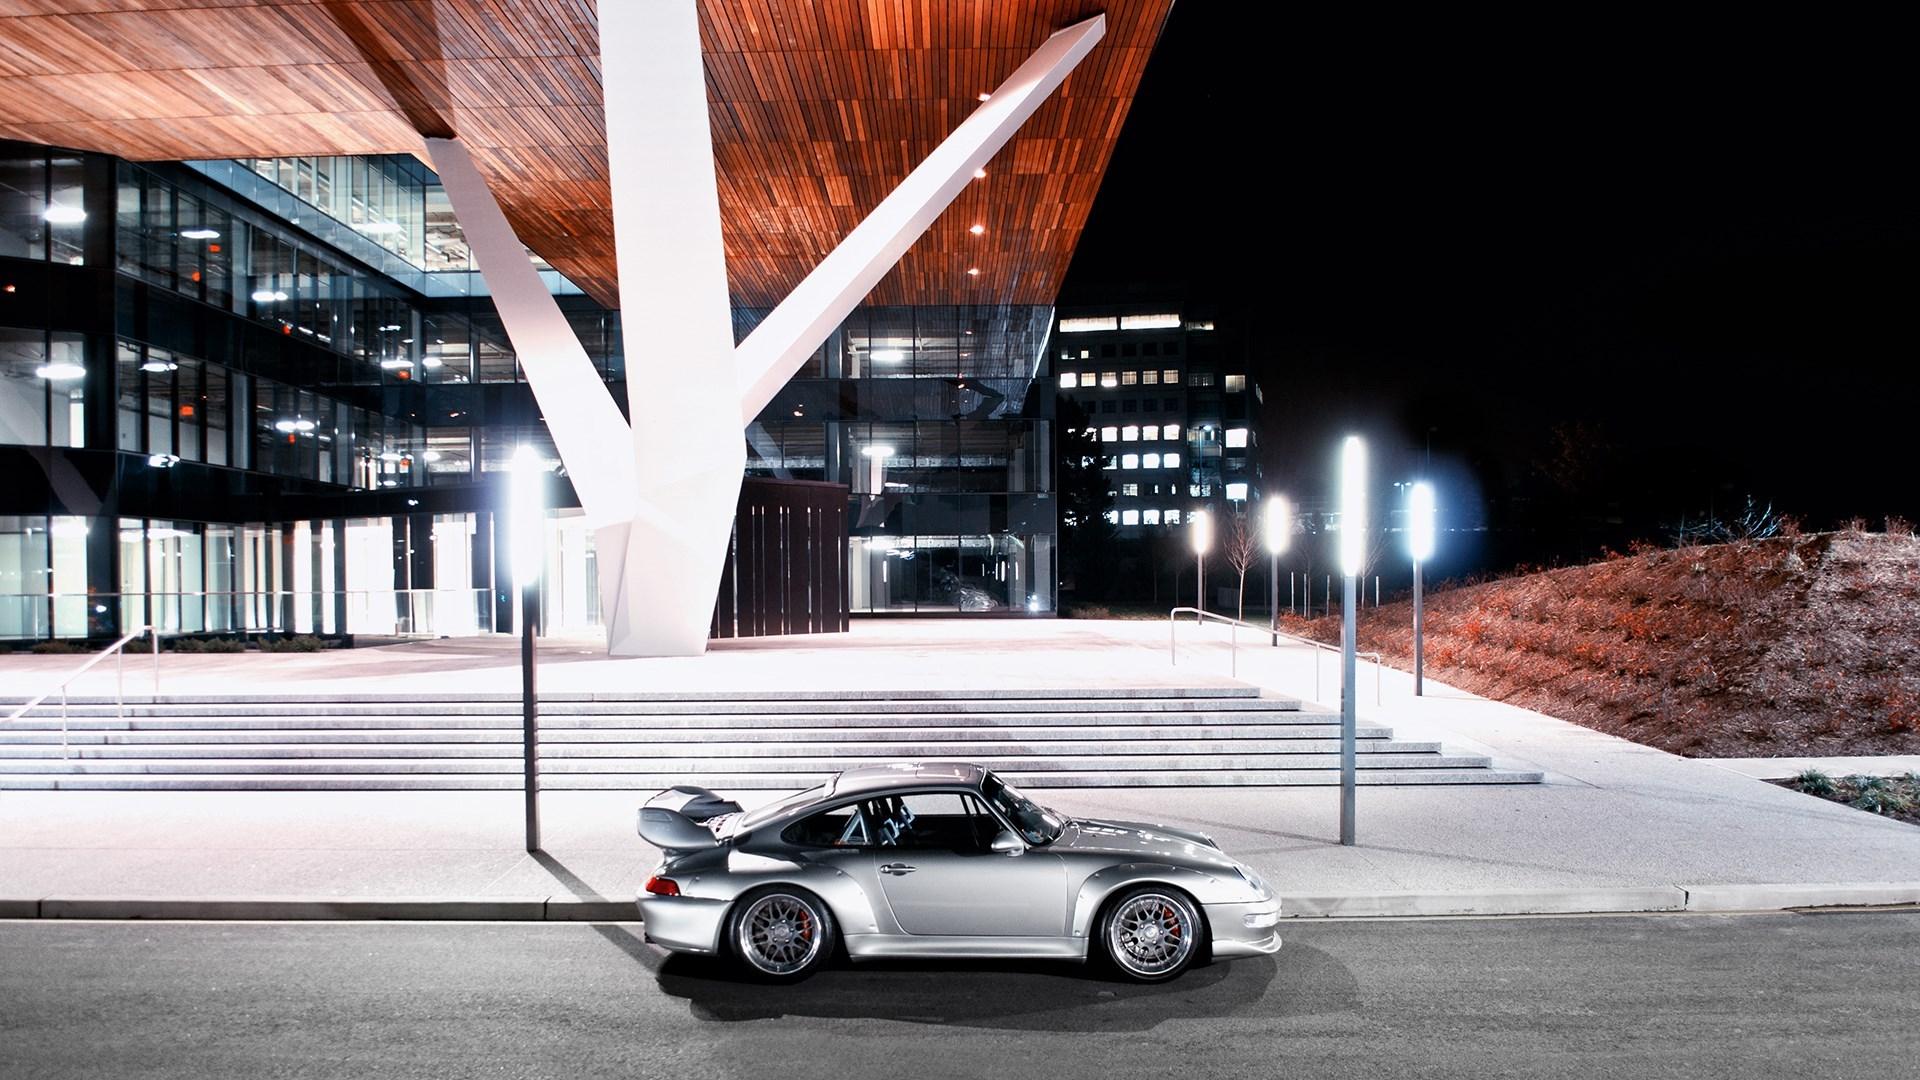 Porsche City Night